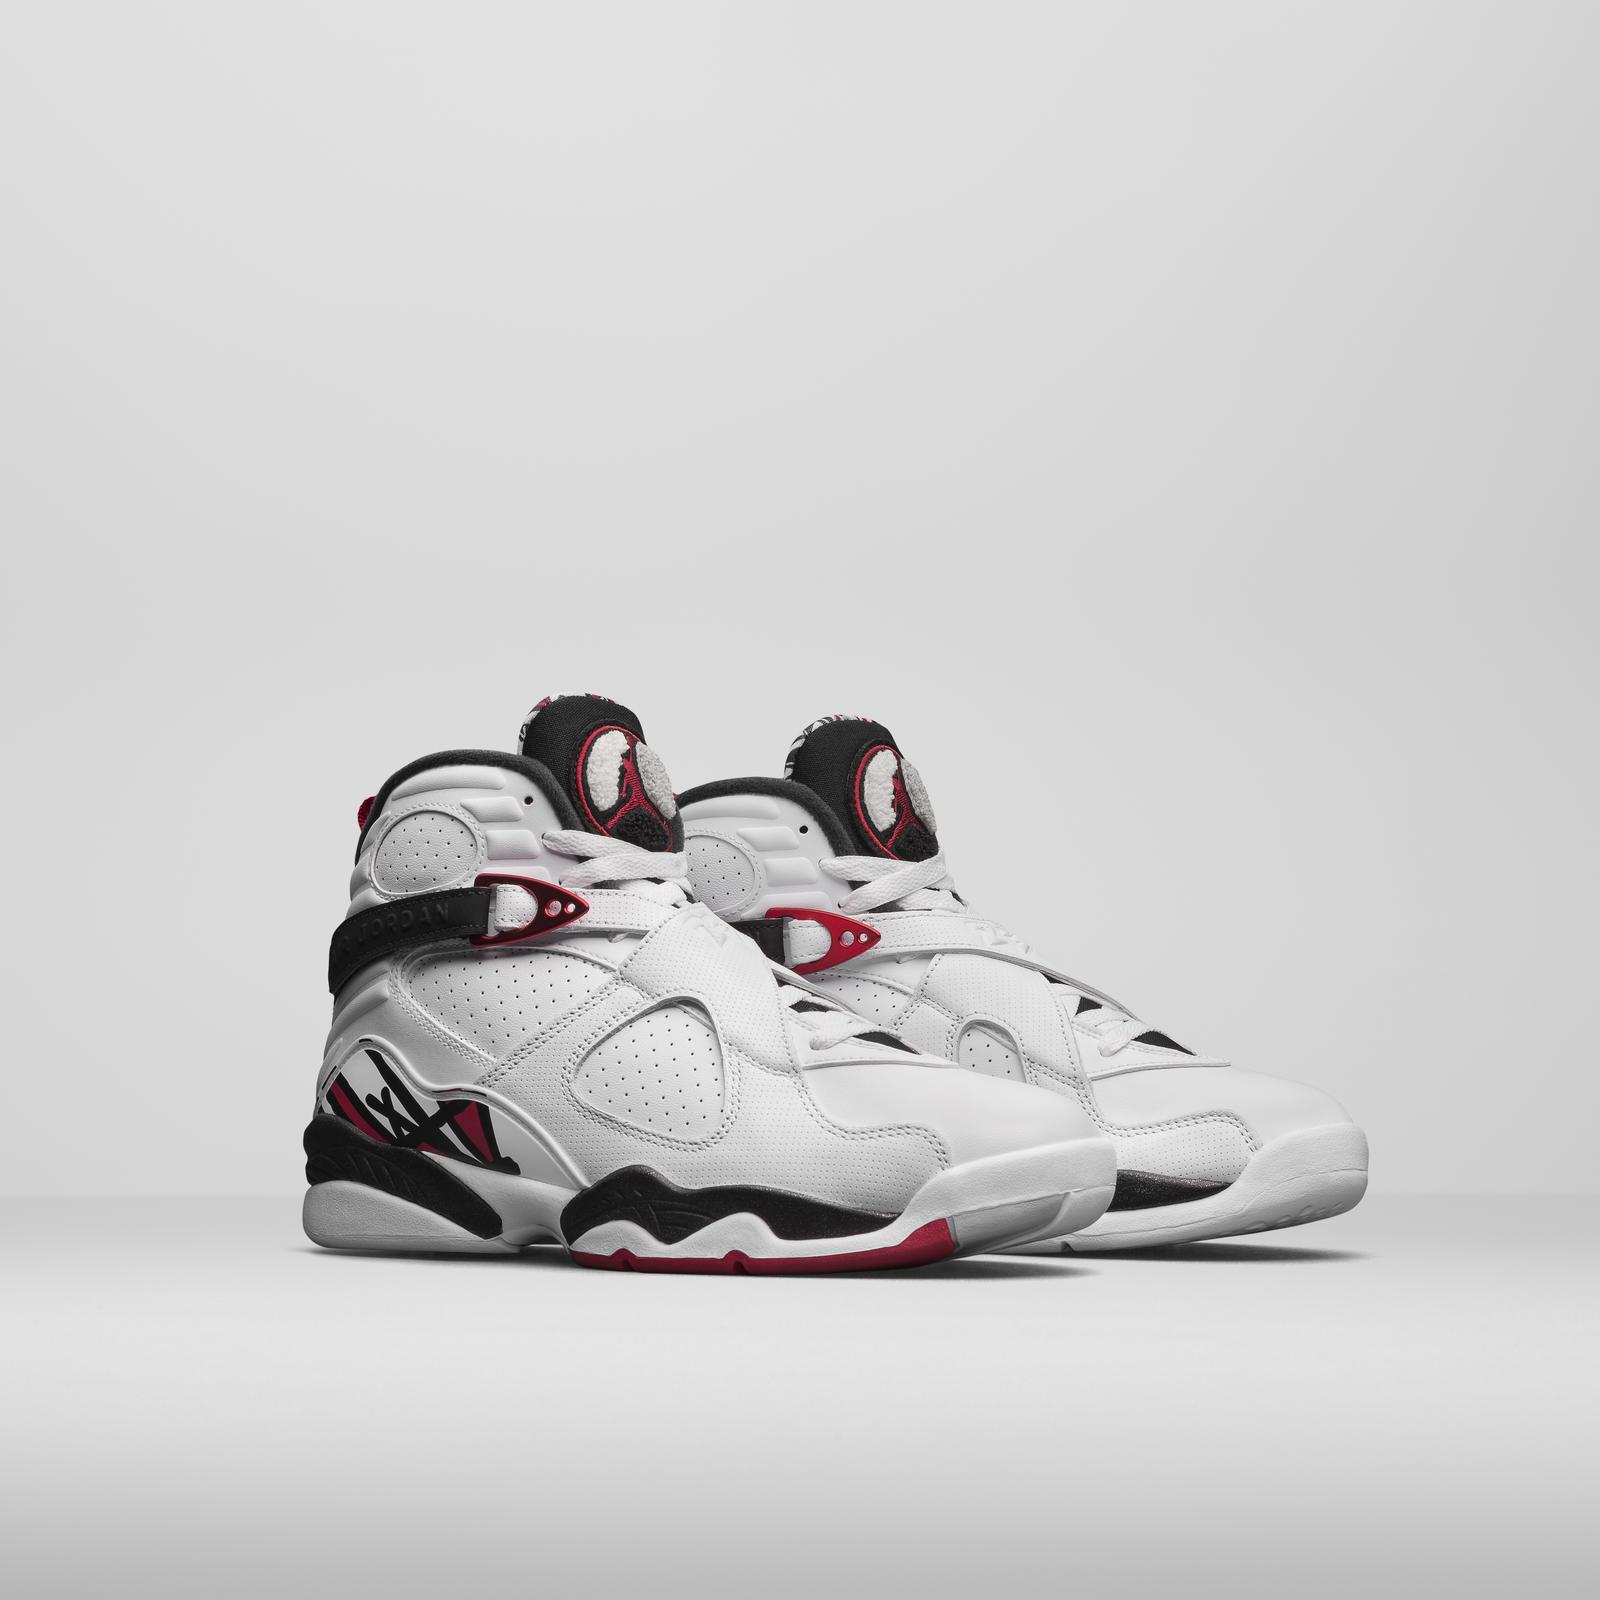 b94b0d164276dd Jordan Brand Unveils Select Spring 17 Air Jordan Silhouettes - Nike News